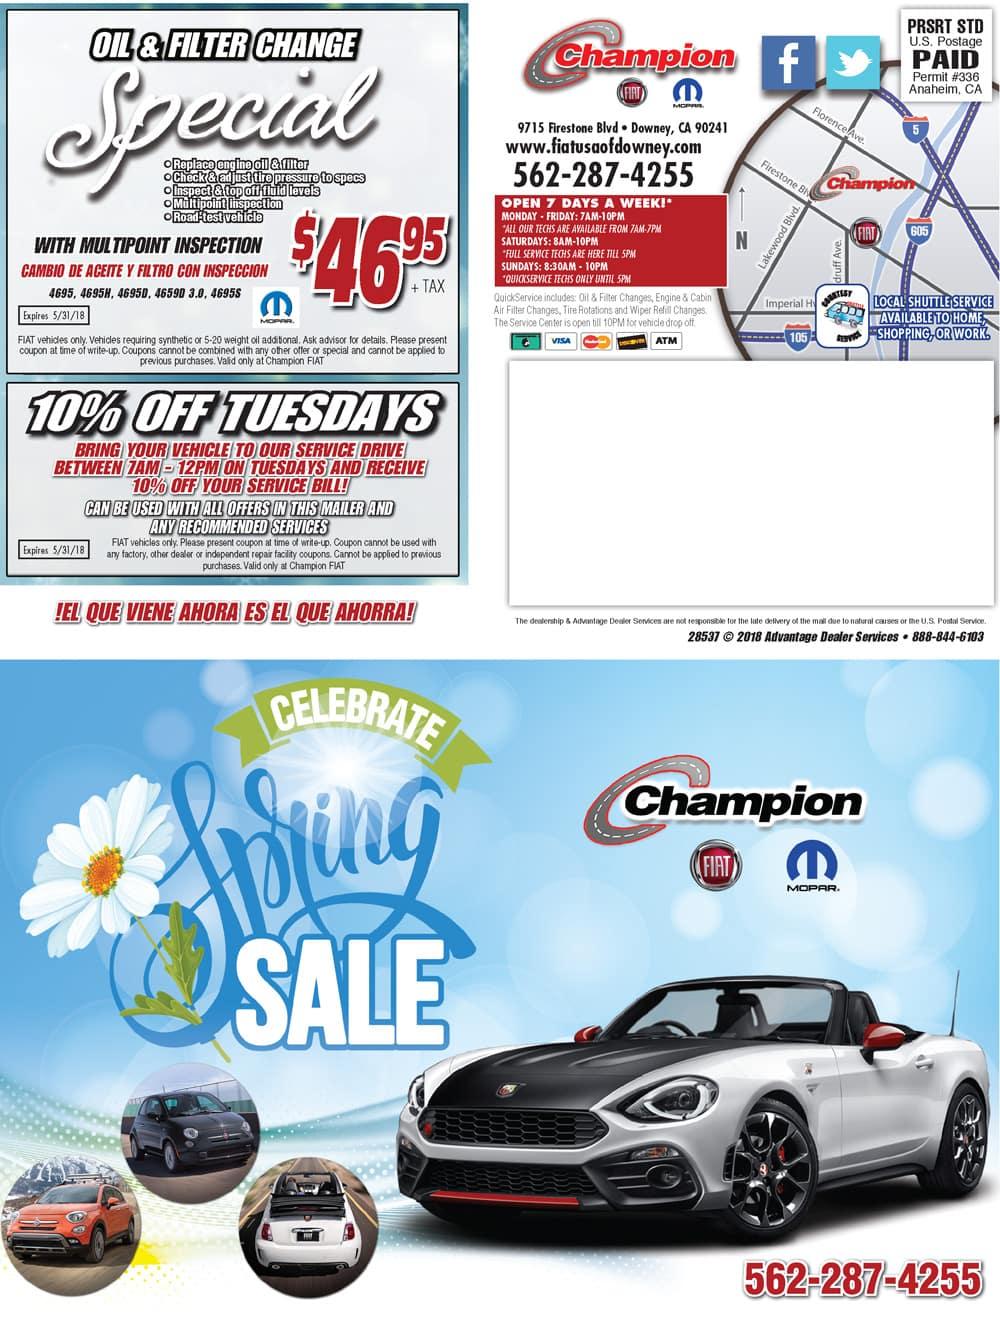 28537_Champion-FIAT-1